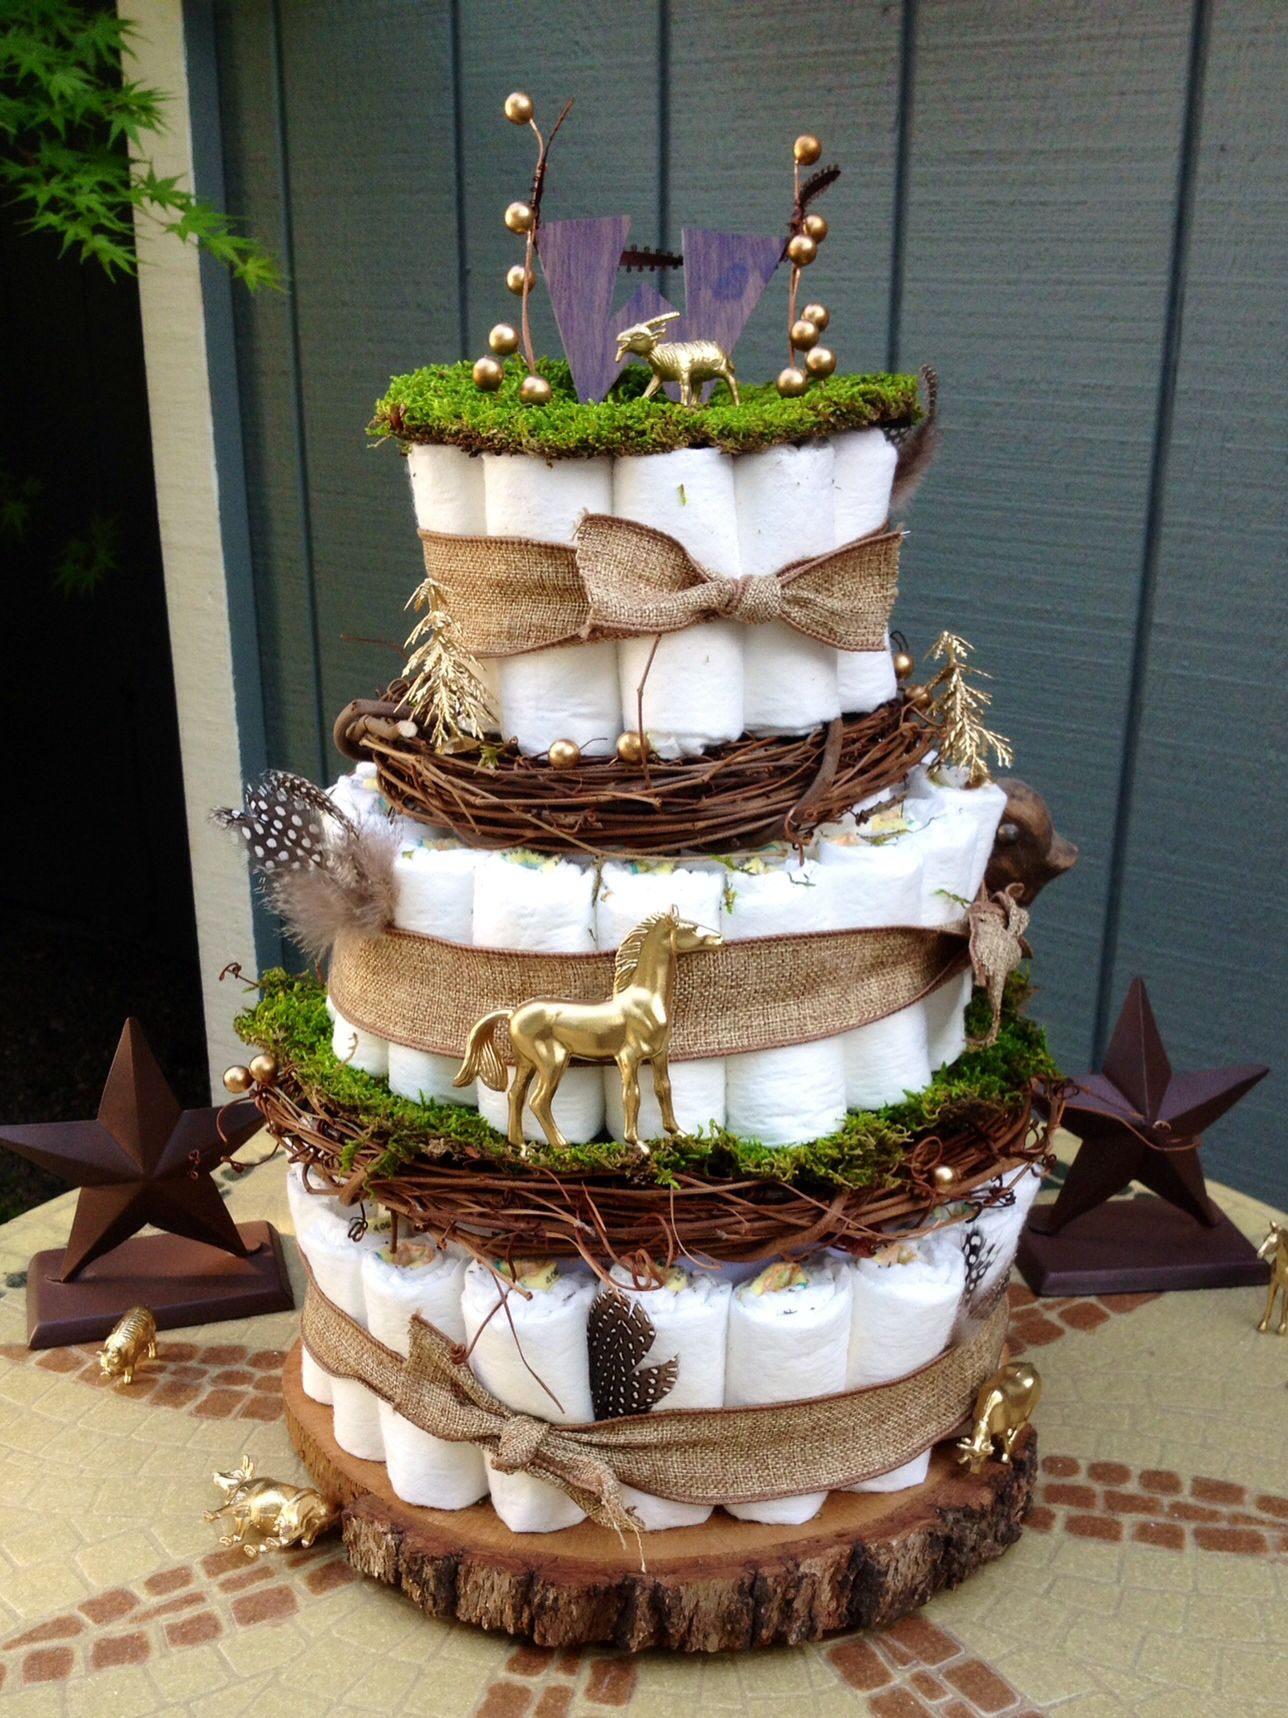 A Magical Woodland Diaper Cake Kelly Teske Goldsworthy